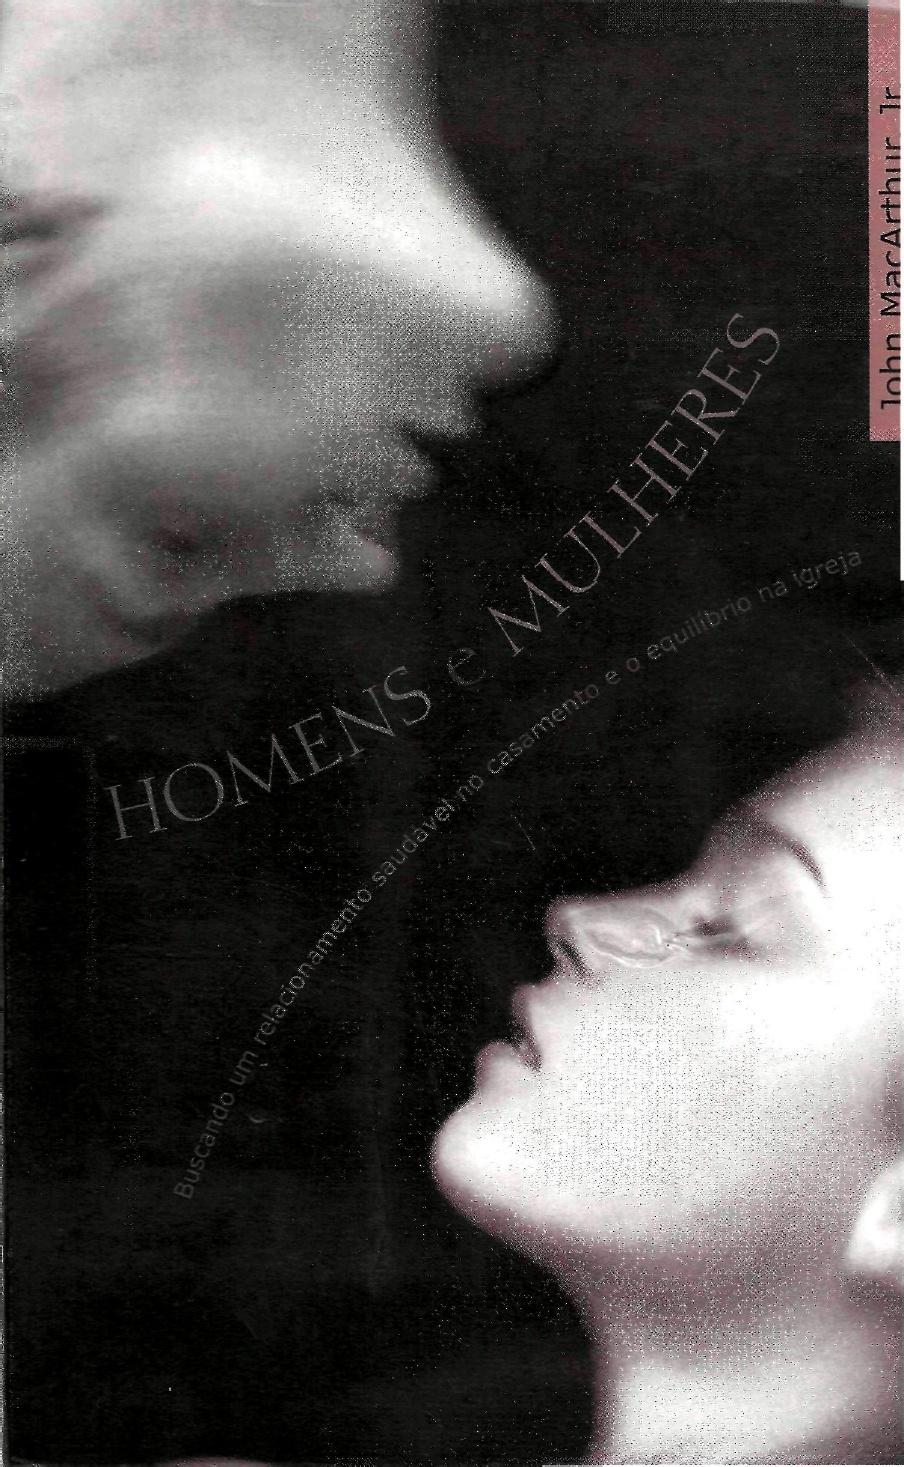 John MacArthur-Homens e Mulheres-